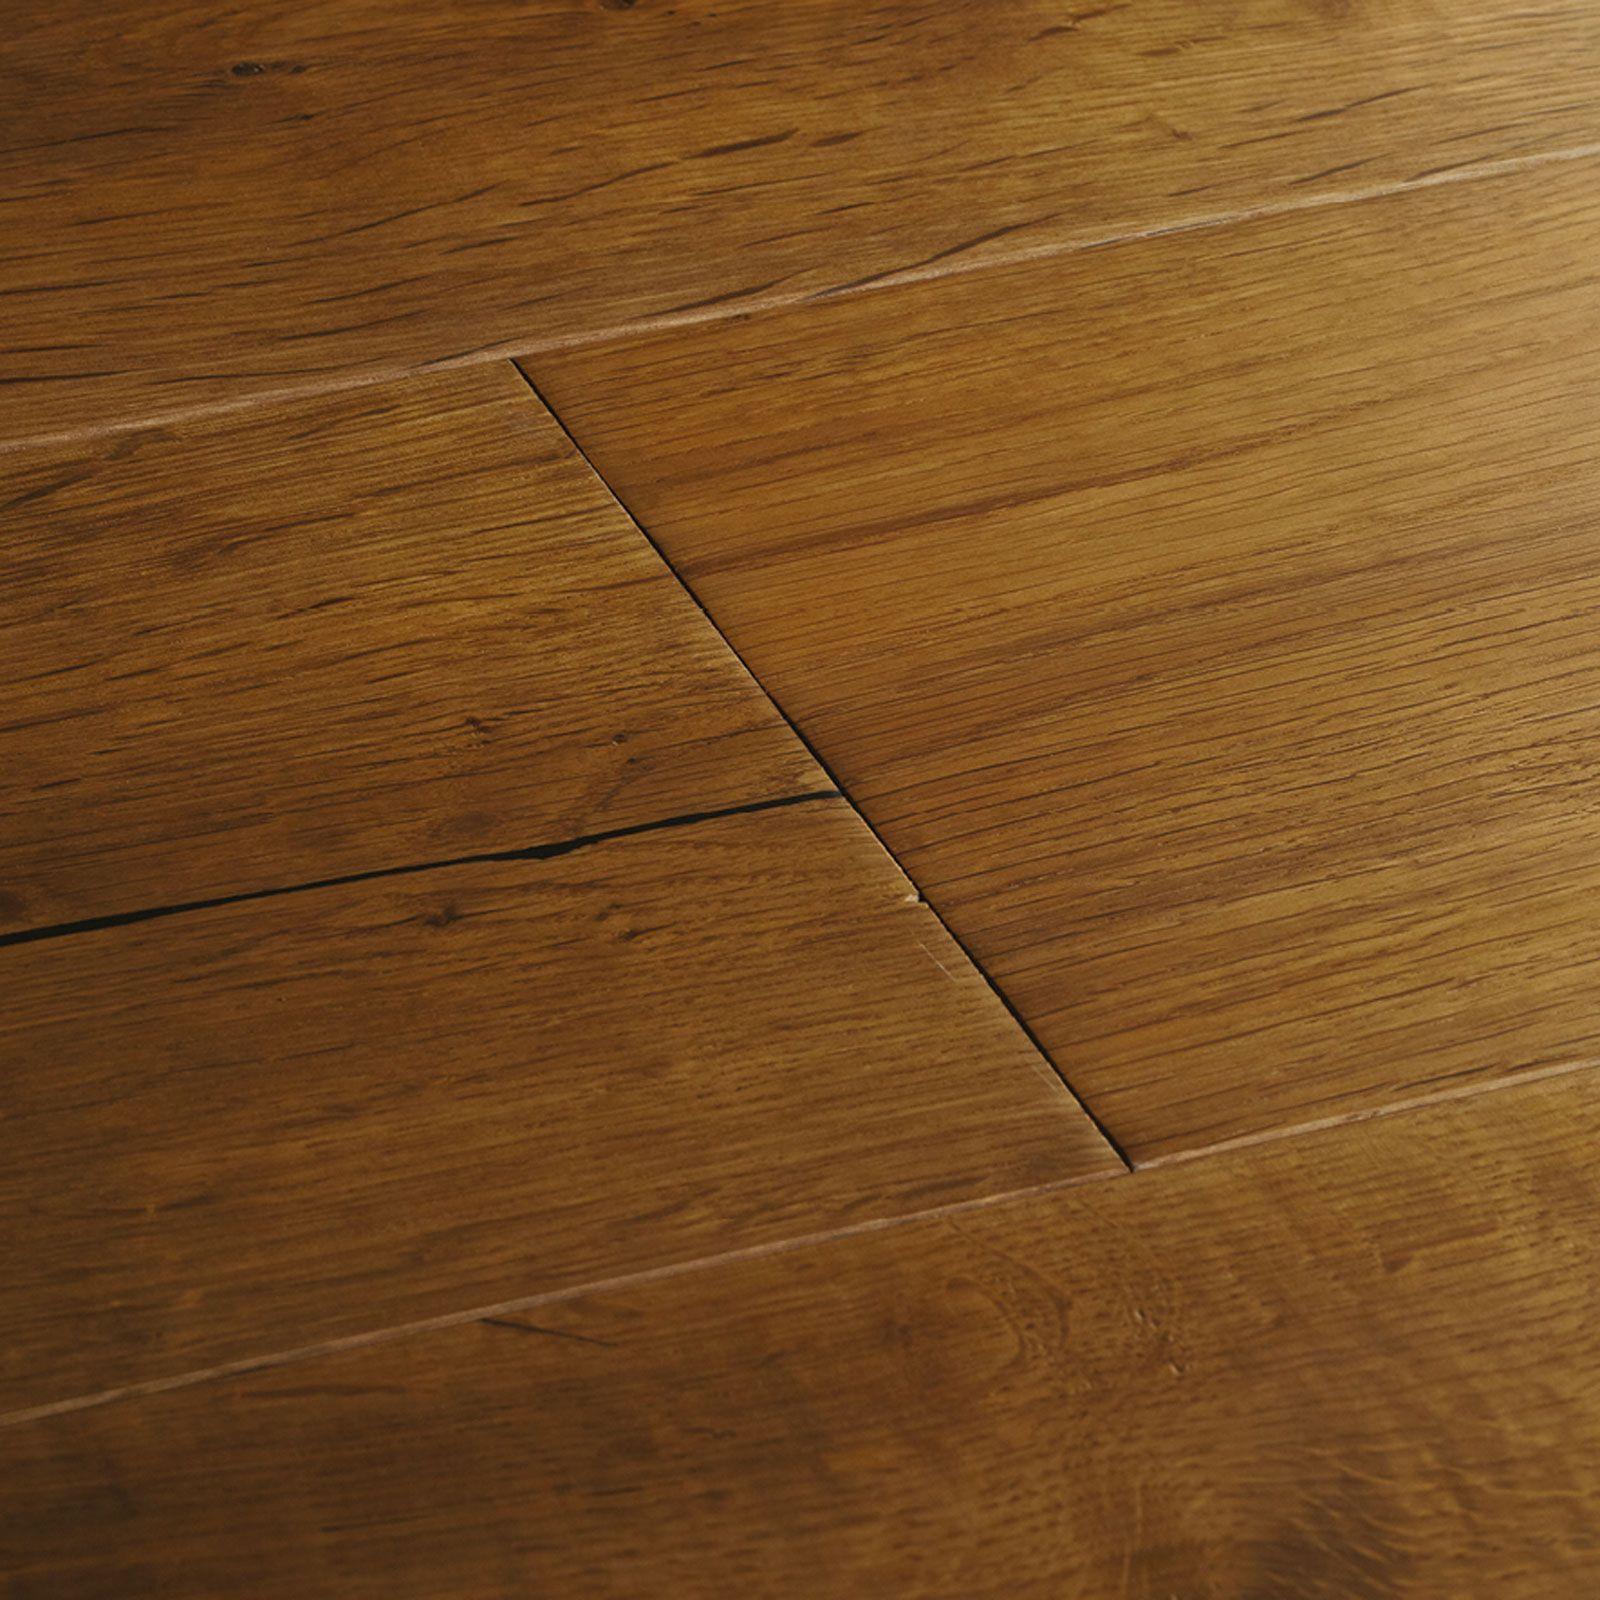 distressed hardwood flooring cost of distressed wood flooring kronotex amazon harbour oak floor plan ideas for distressed wood flooring berkeley smoked oak